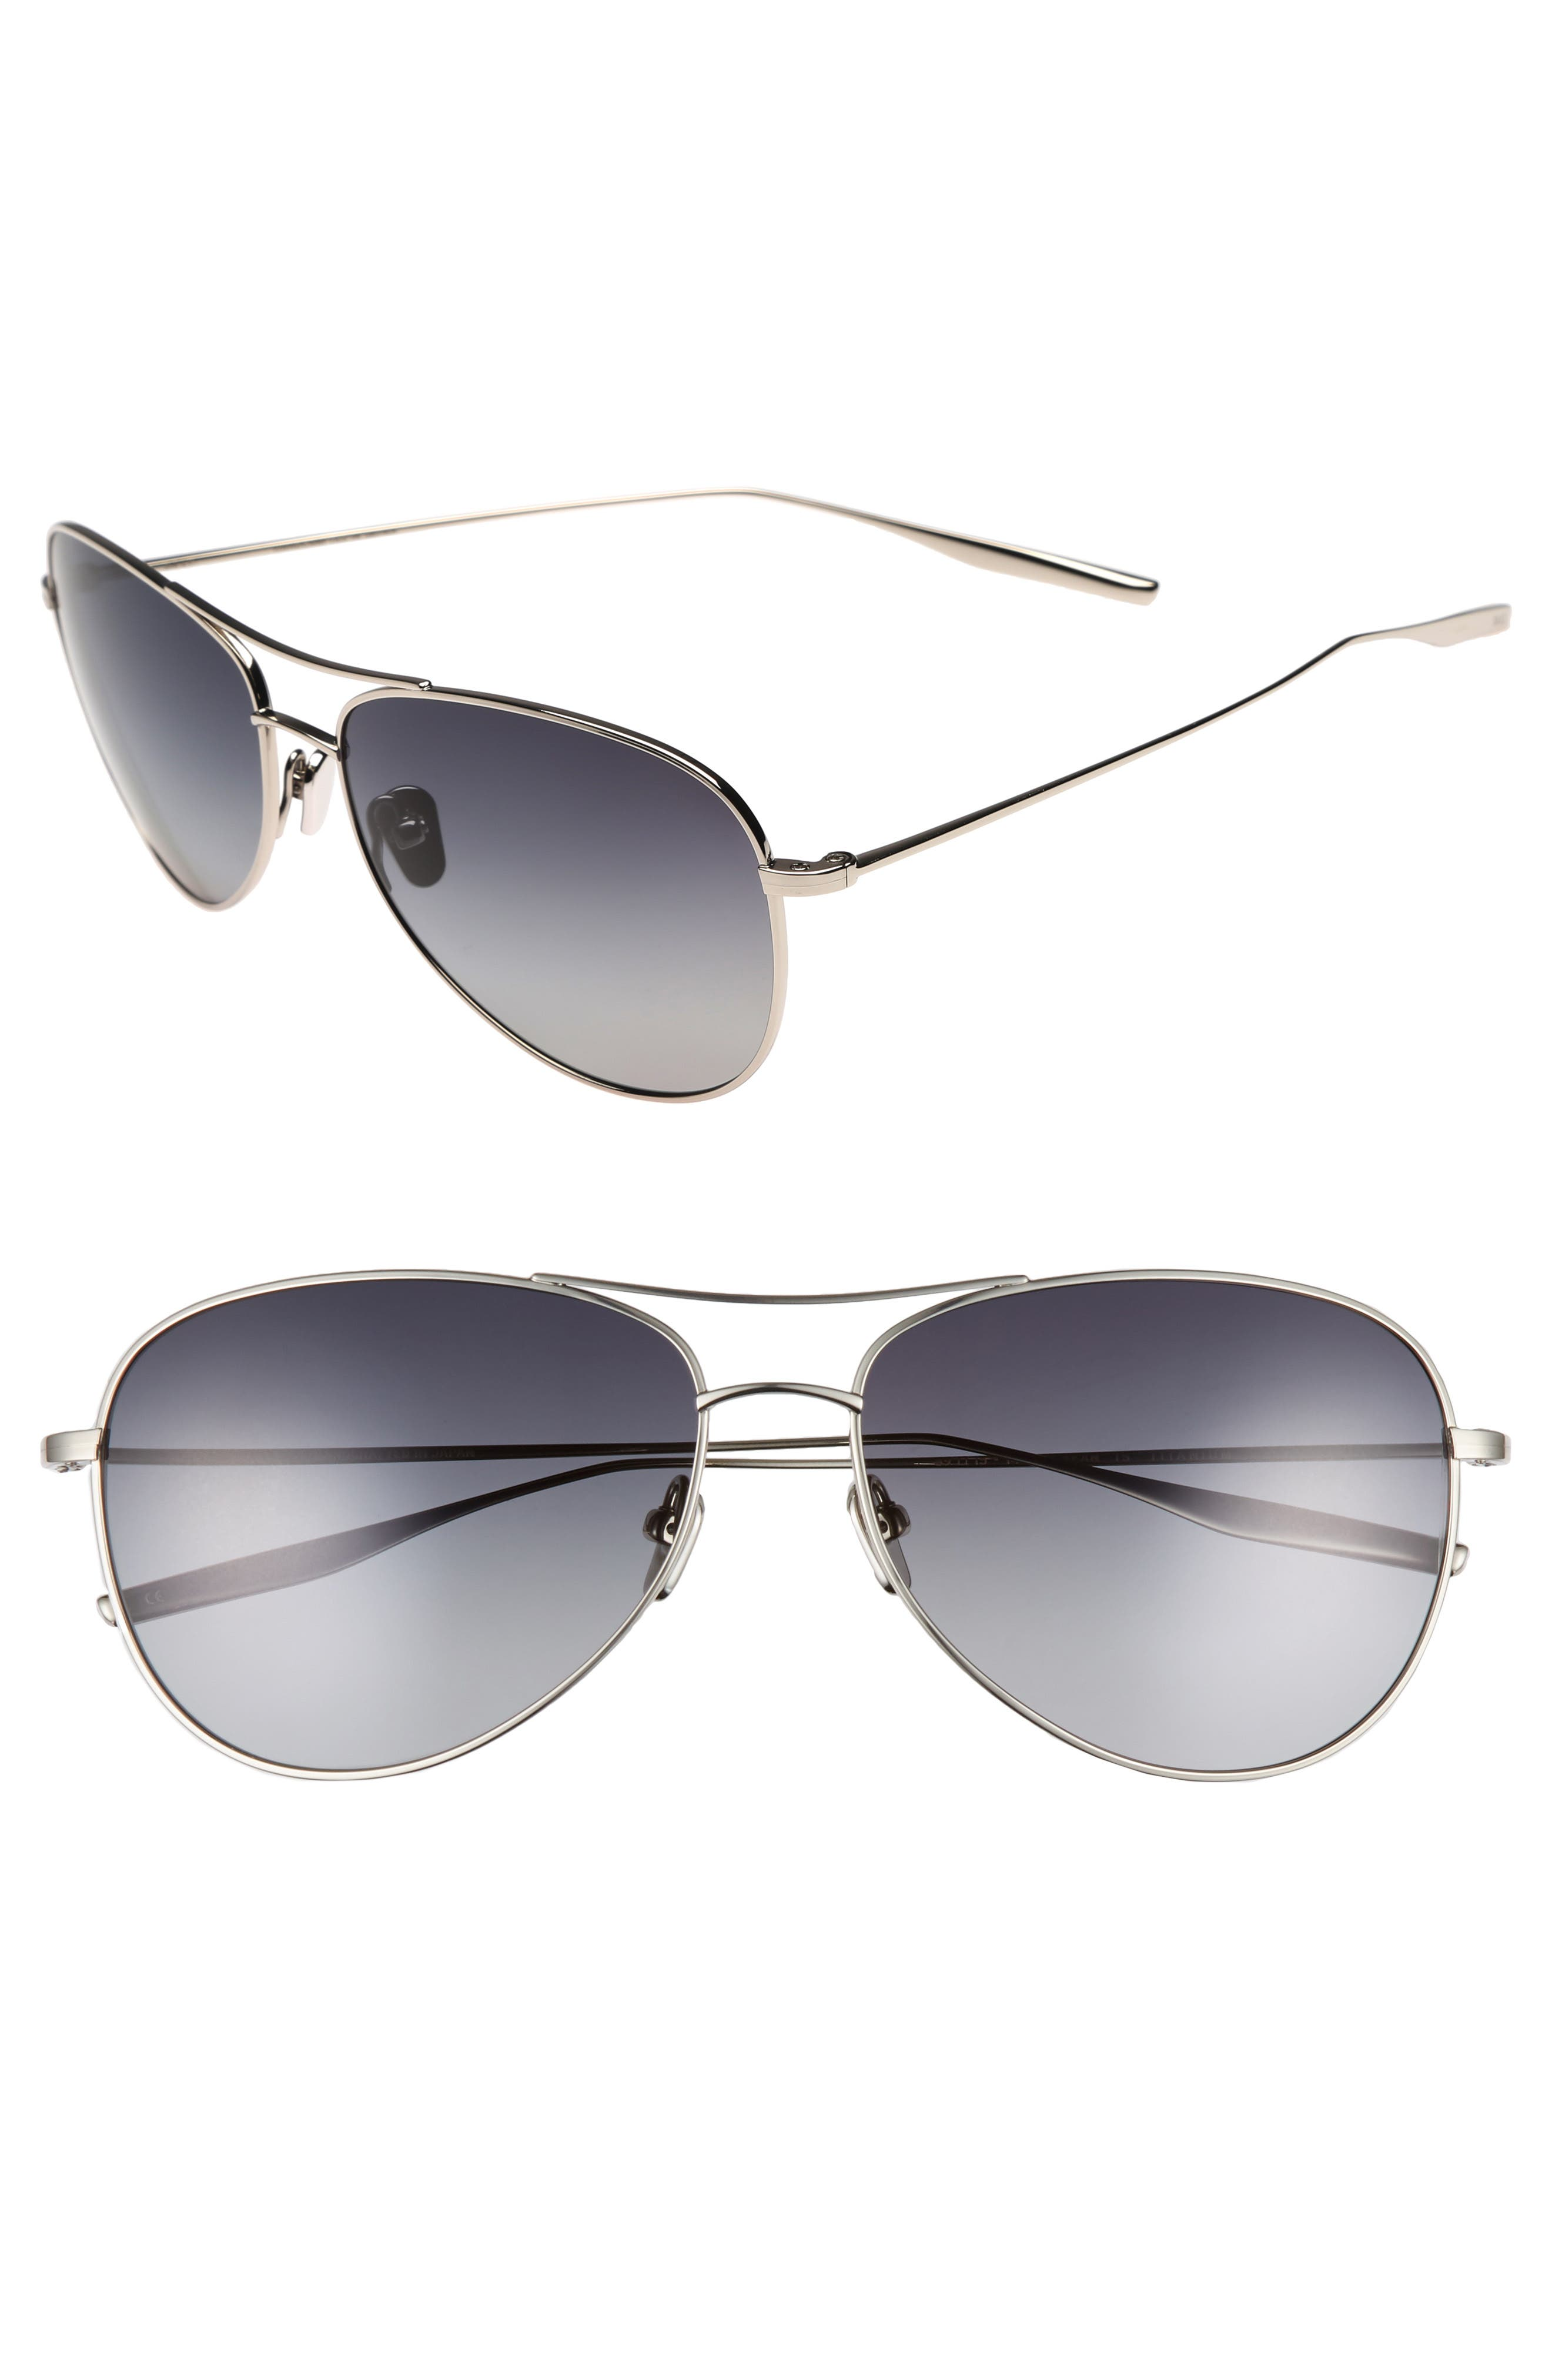 McKean 59mm Aviator Sunglasses,                         Main,                         color, TRADITIONAL SILVER